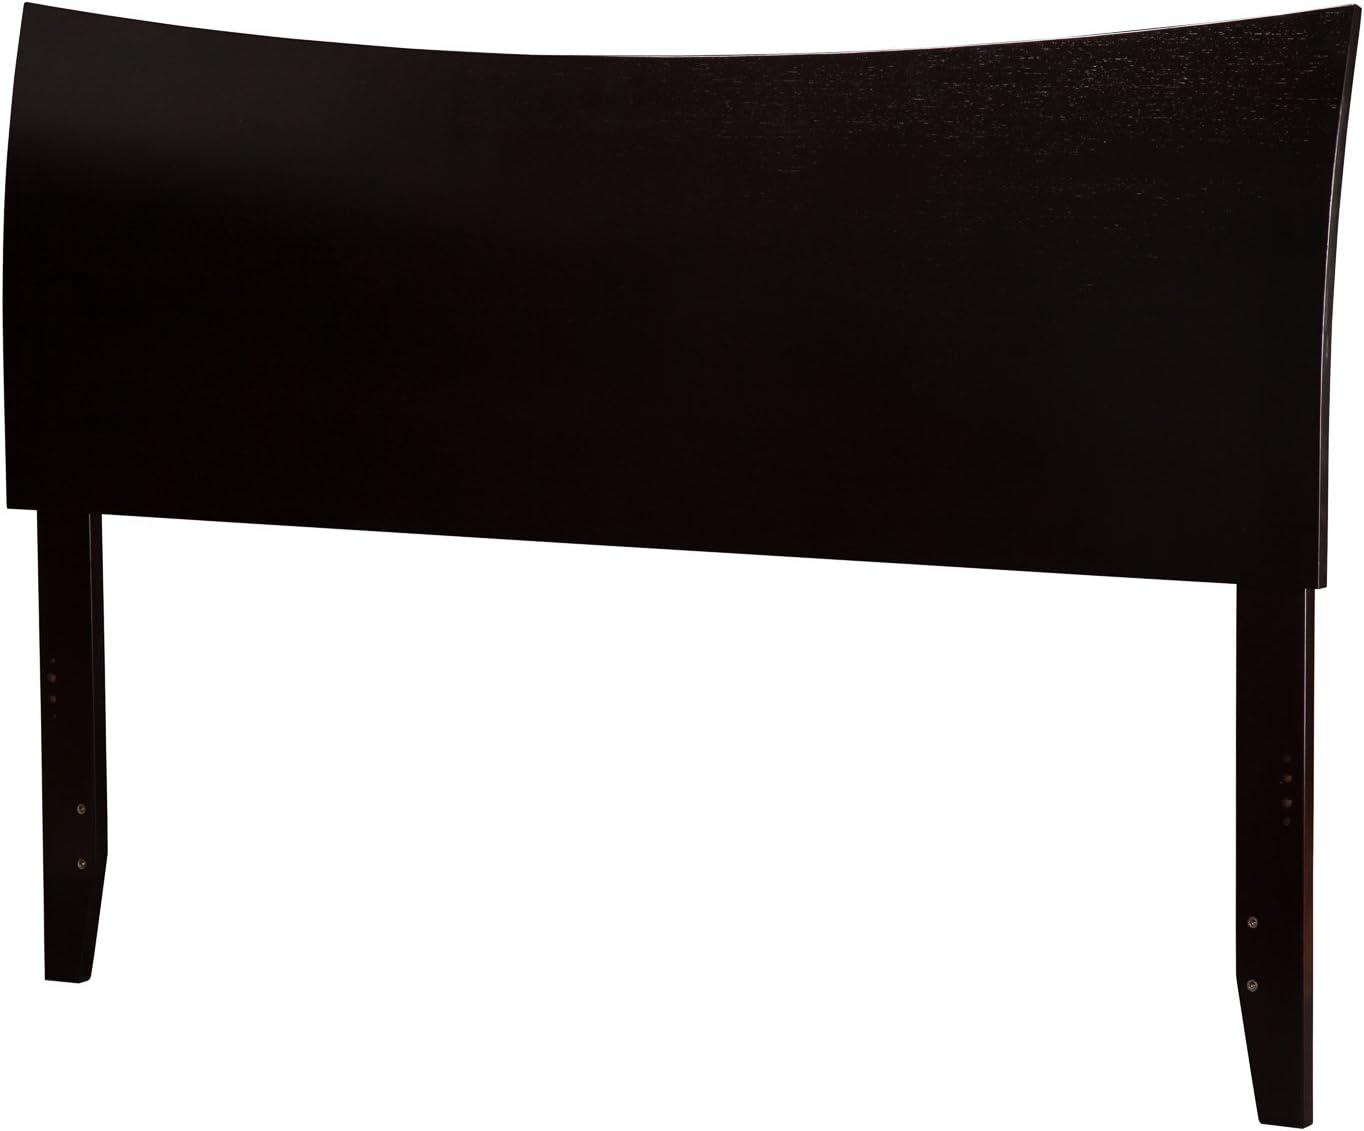 Atlantic Furniture Soho Headboard, Queen, Espresso